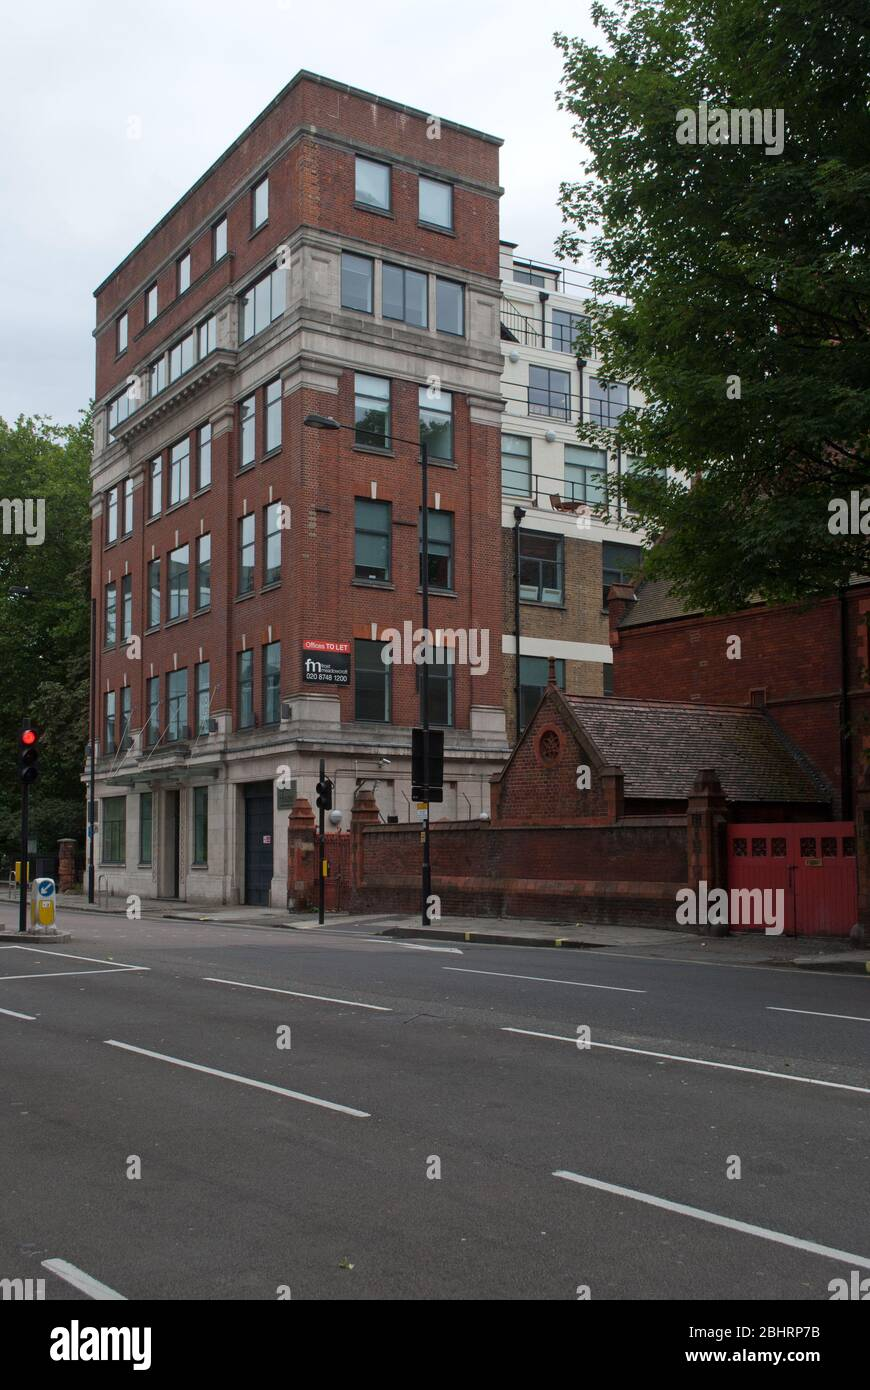 Lyric Brick House : lyric, brick, house, Architecture, Brick, Portland, Stone, Lyric, House,, Hammersmith, Road,, Hammersmith,, London, Stock, Photo, Alamy